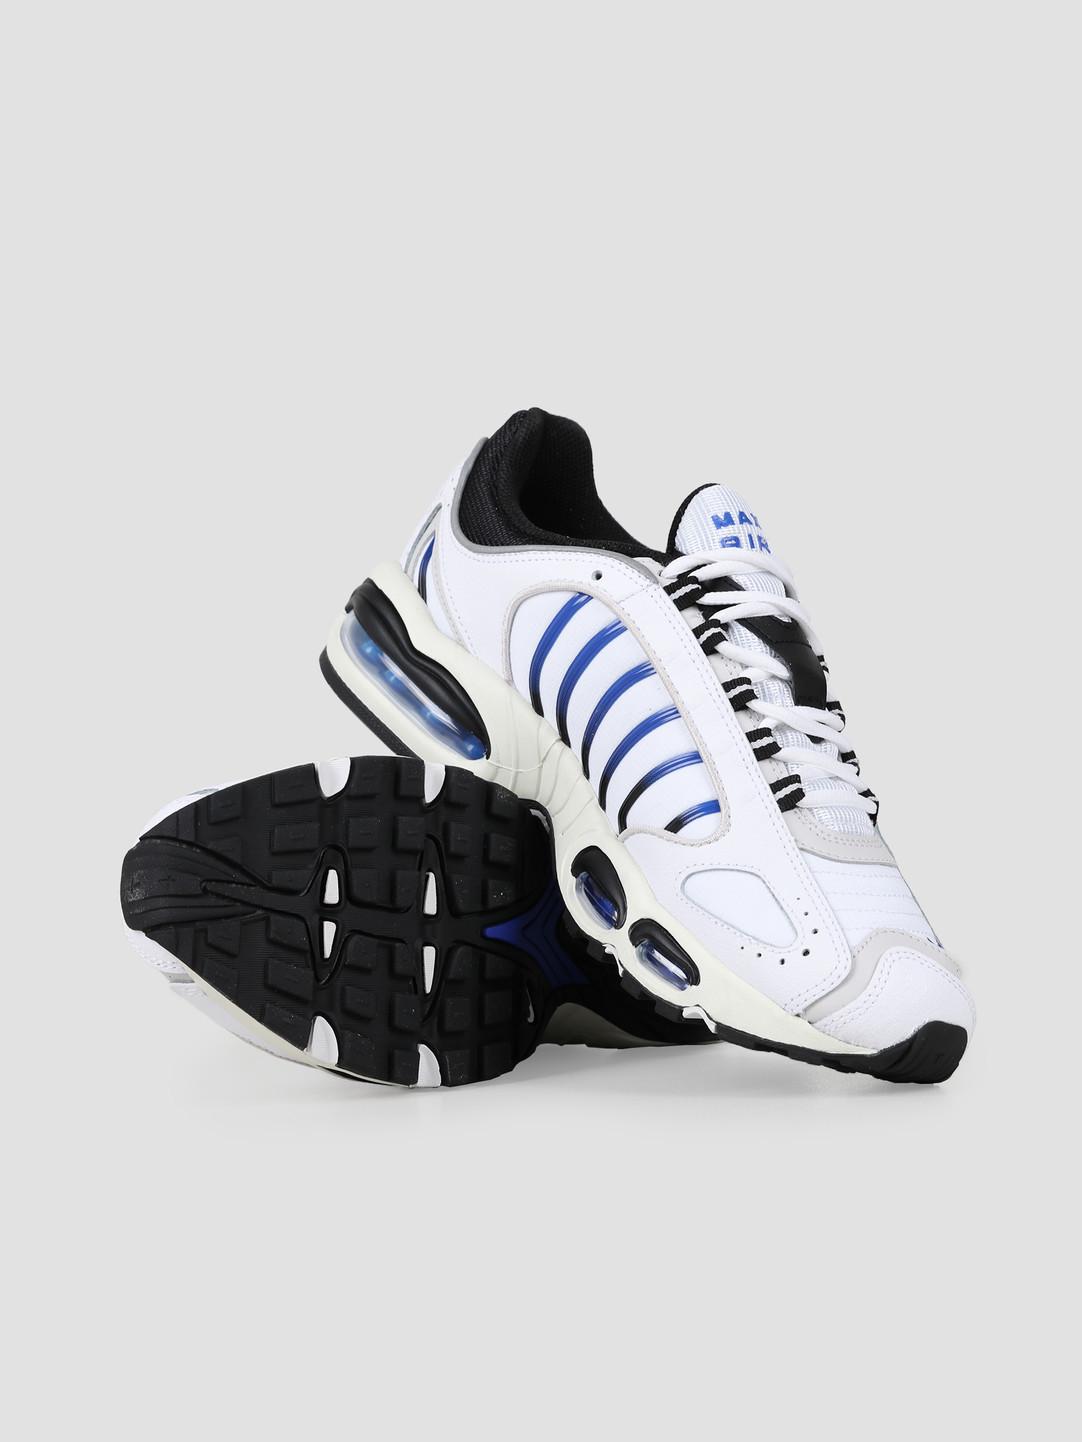 Nike Nike Air Max Tailwind IV White Racer Blue Summit White Vast Grey AQ2567 105